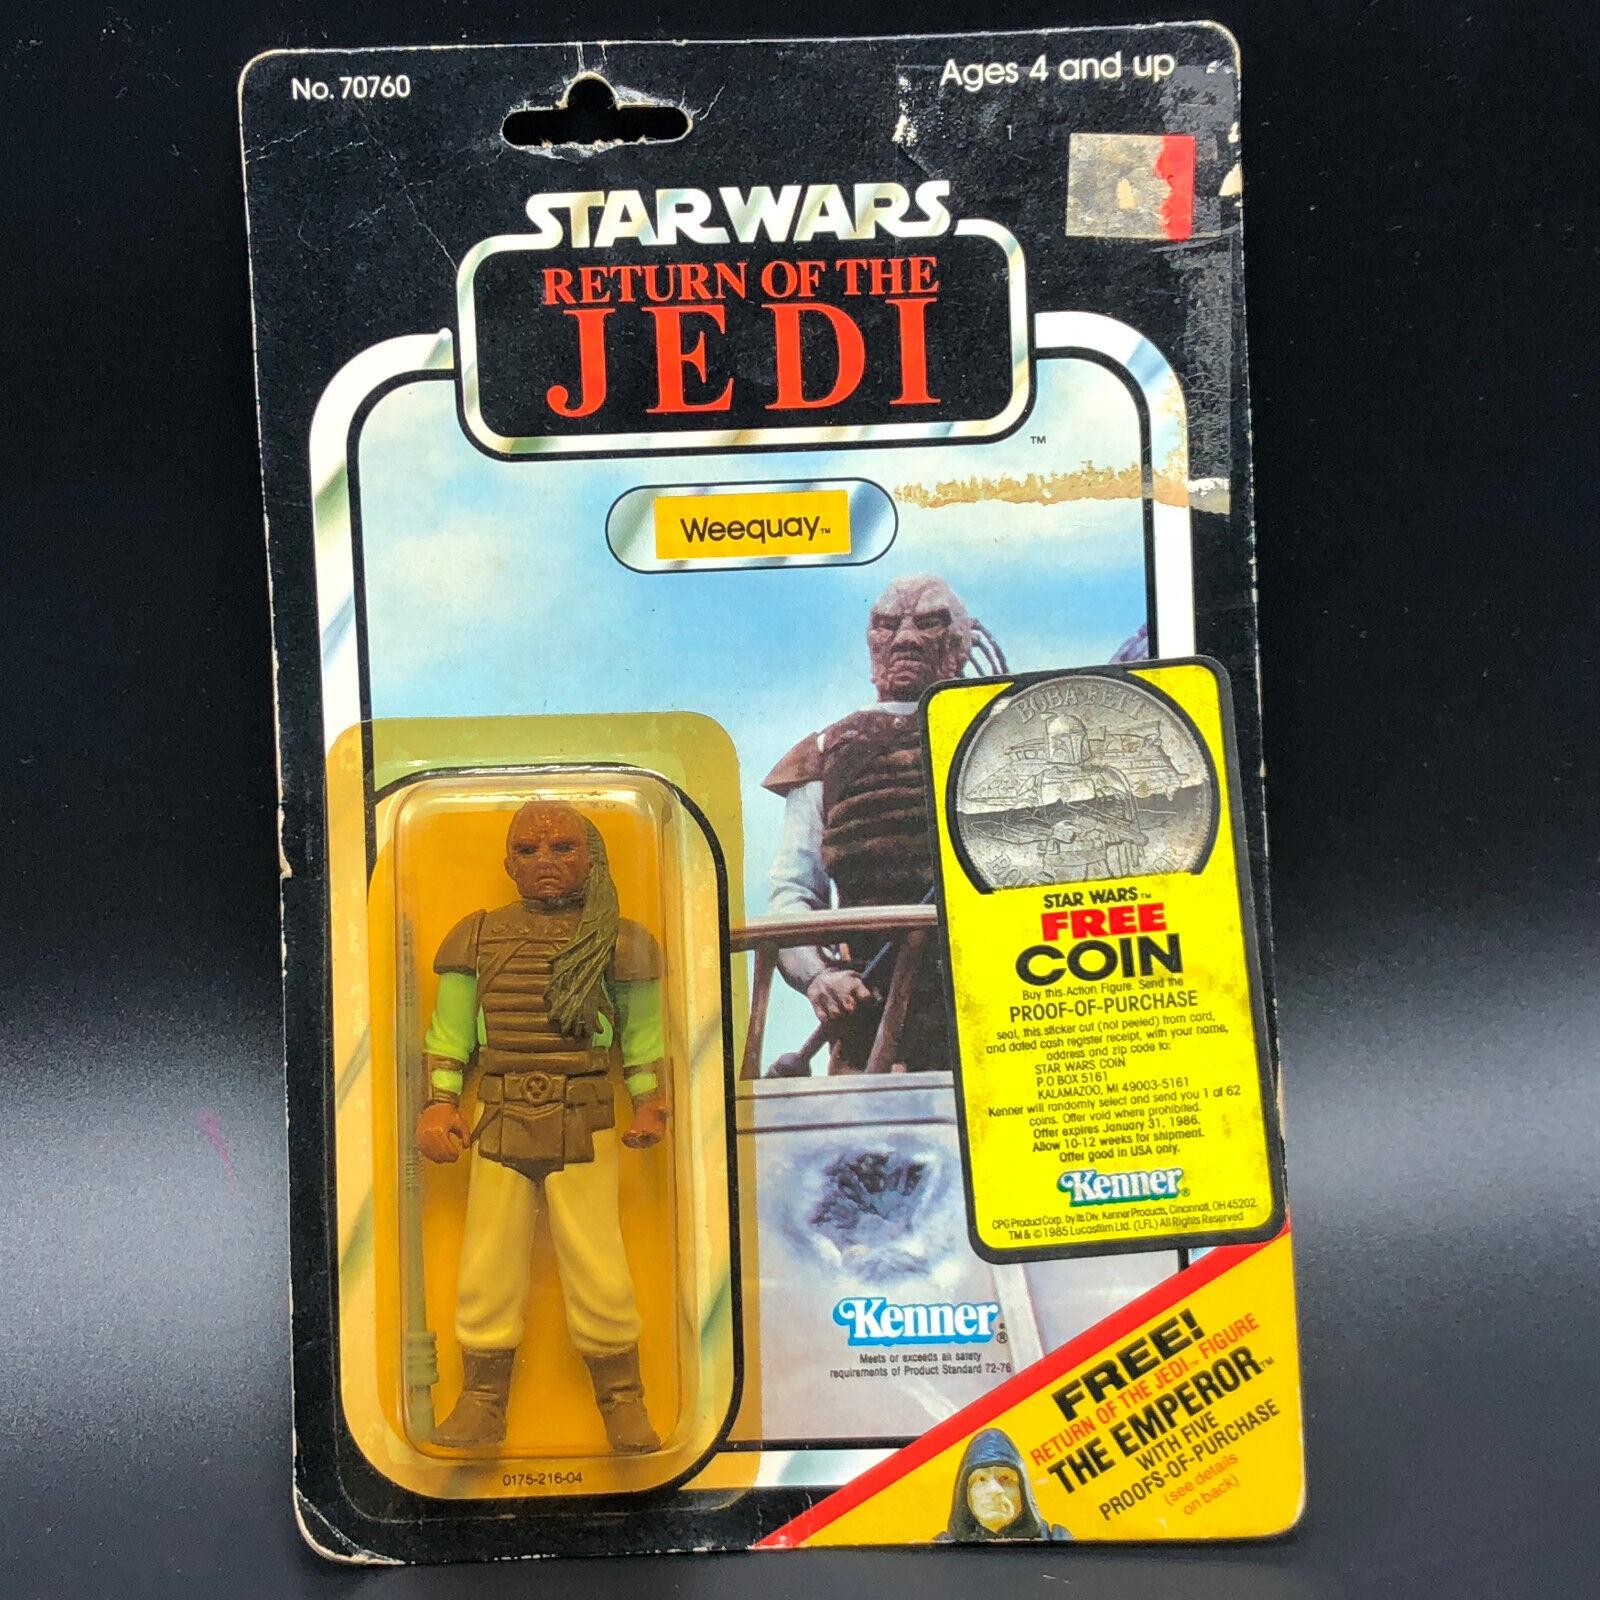 1983 KENNER STAR WARS ACTION FIGURE WEEQUAY moc Jabba hutt guard return of jedi